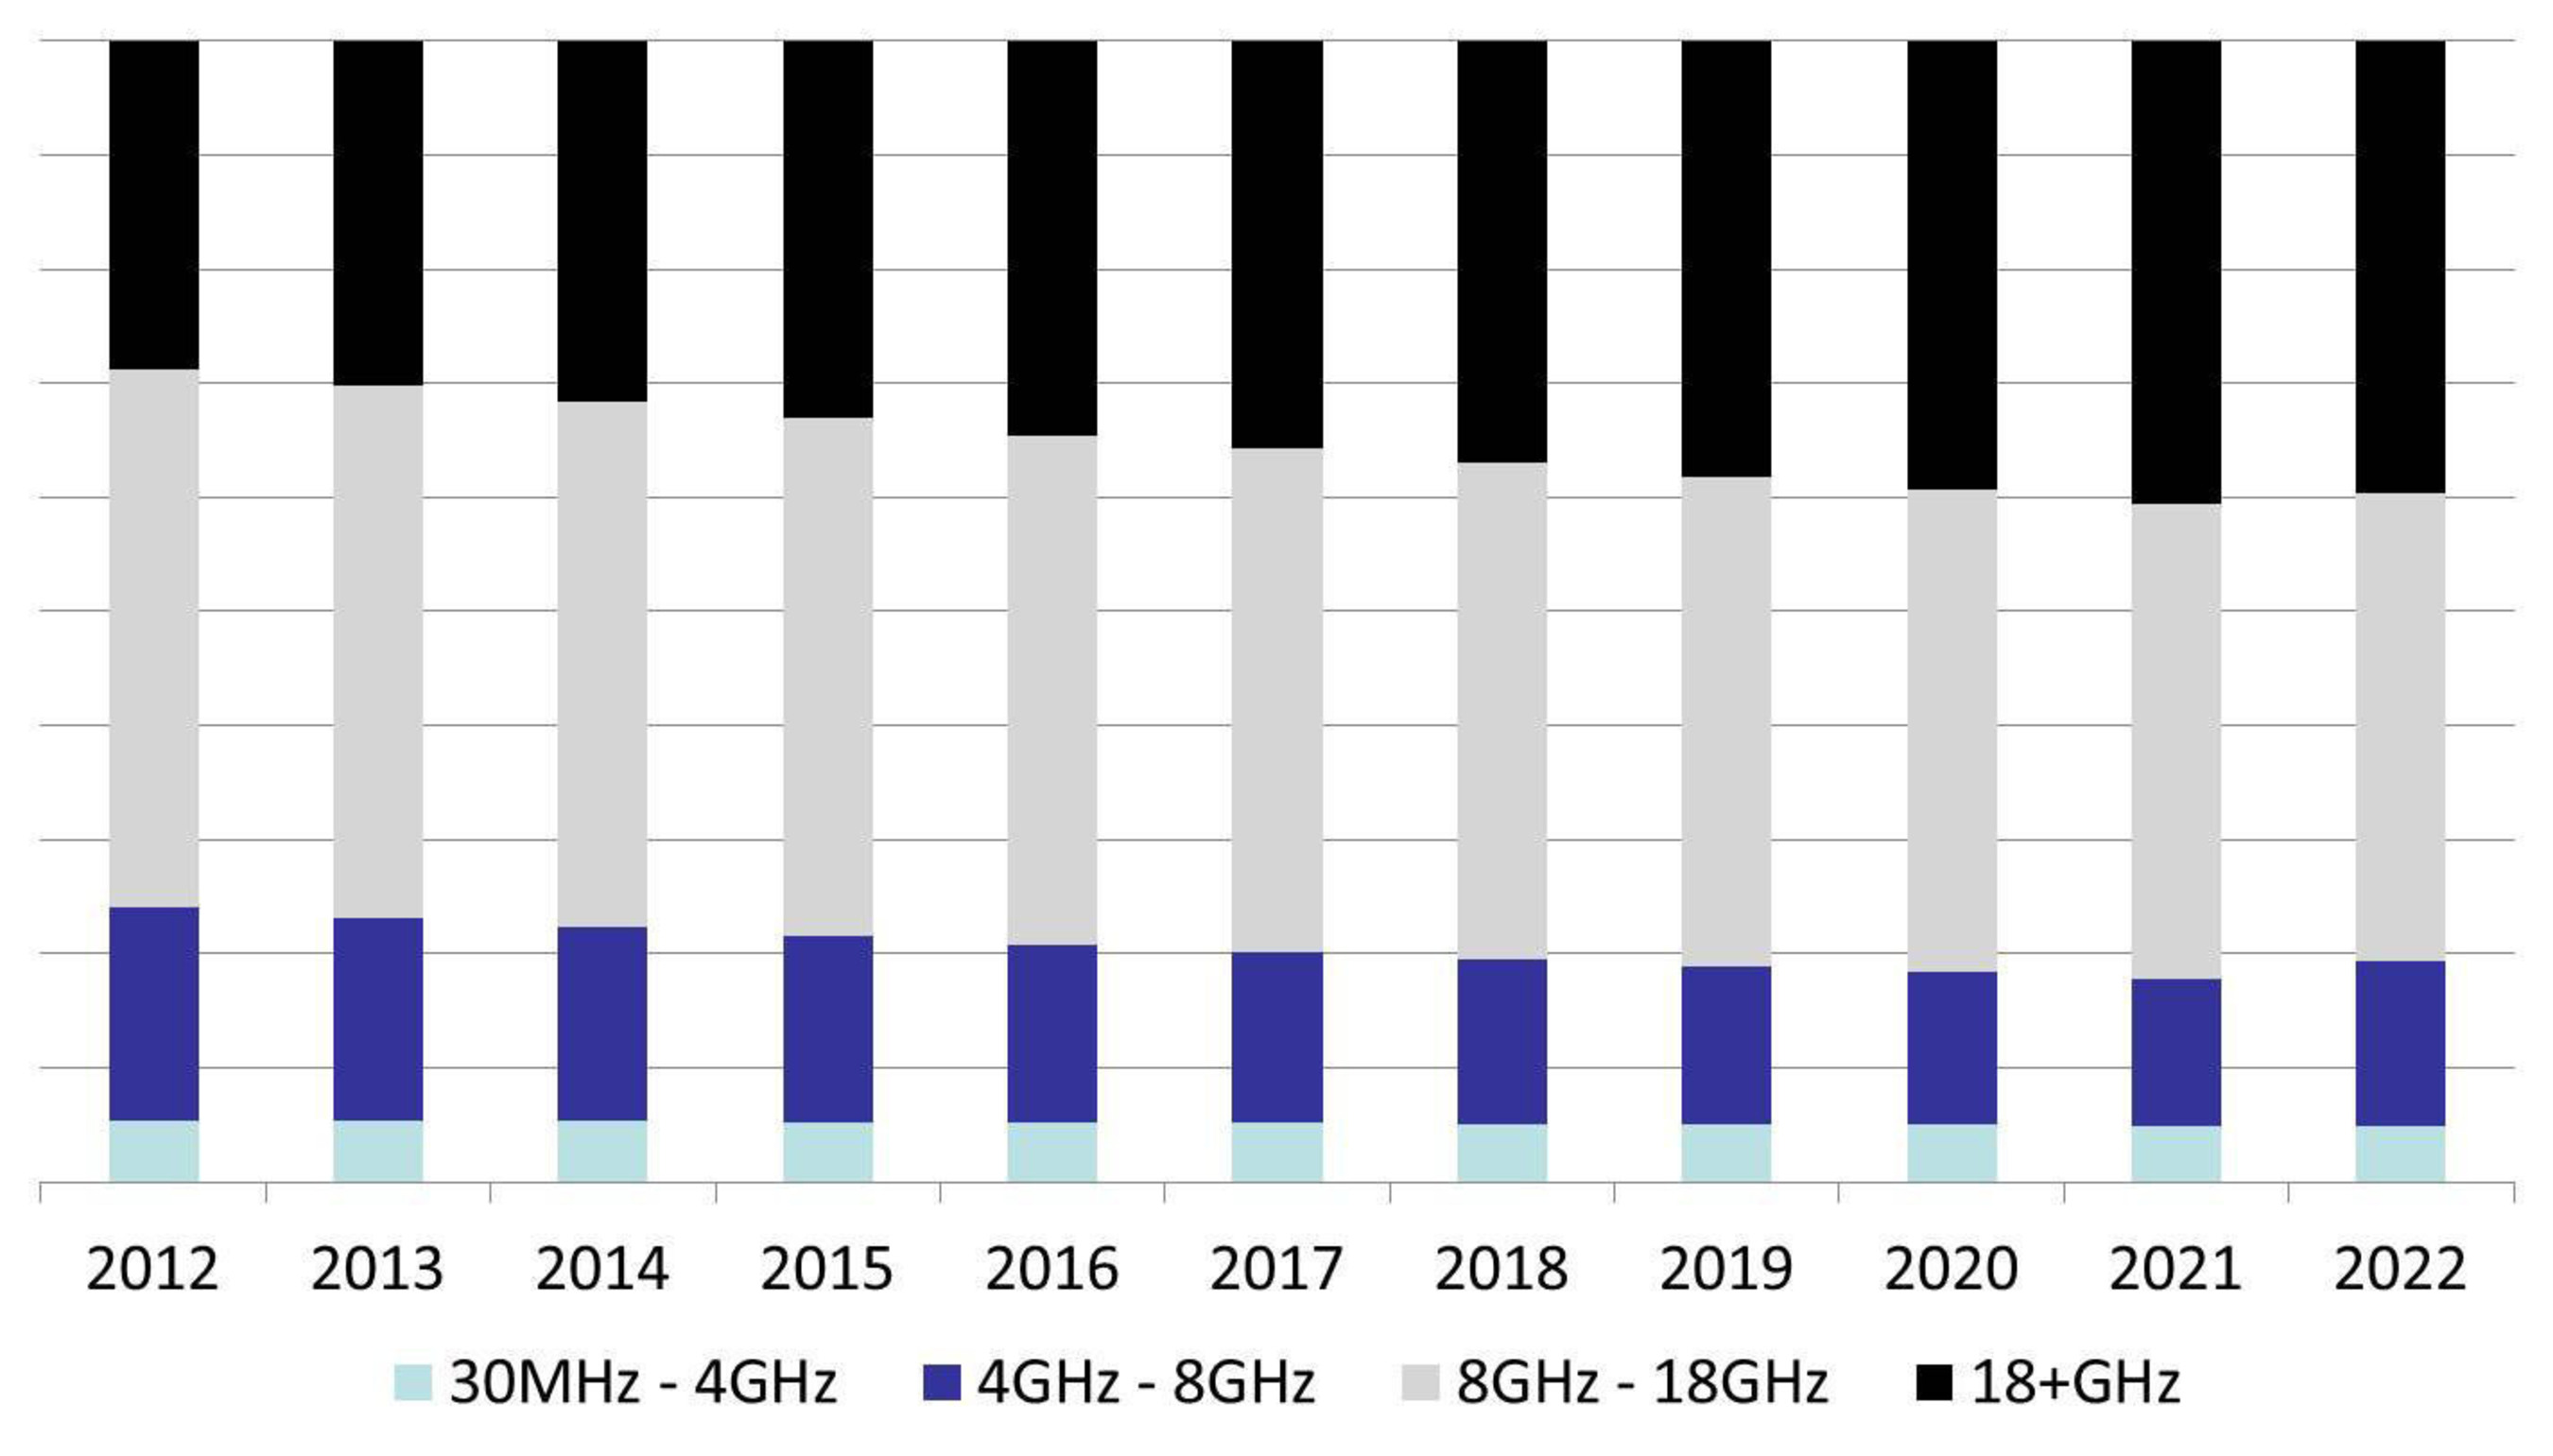 Military Communications Market reaching $30 Billion by 2022, says Strategy Analytics